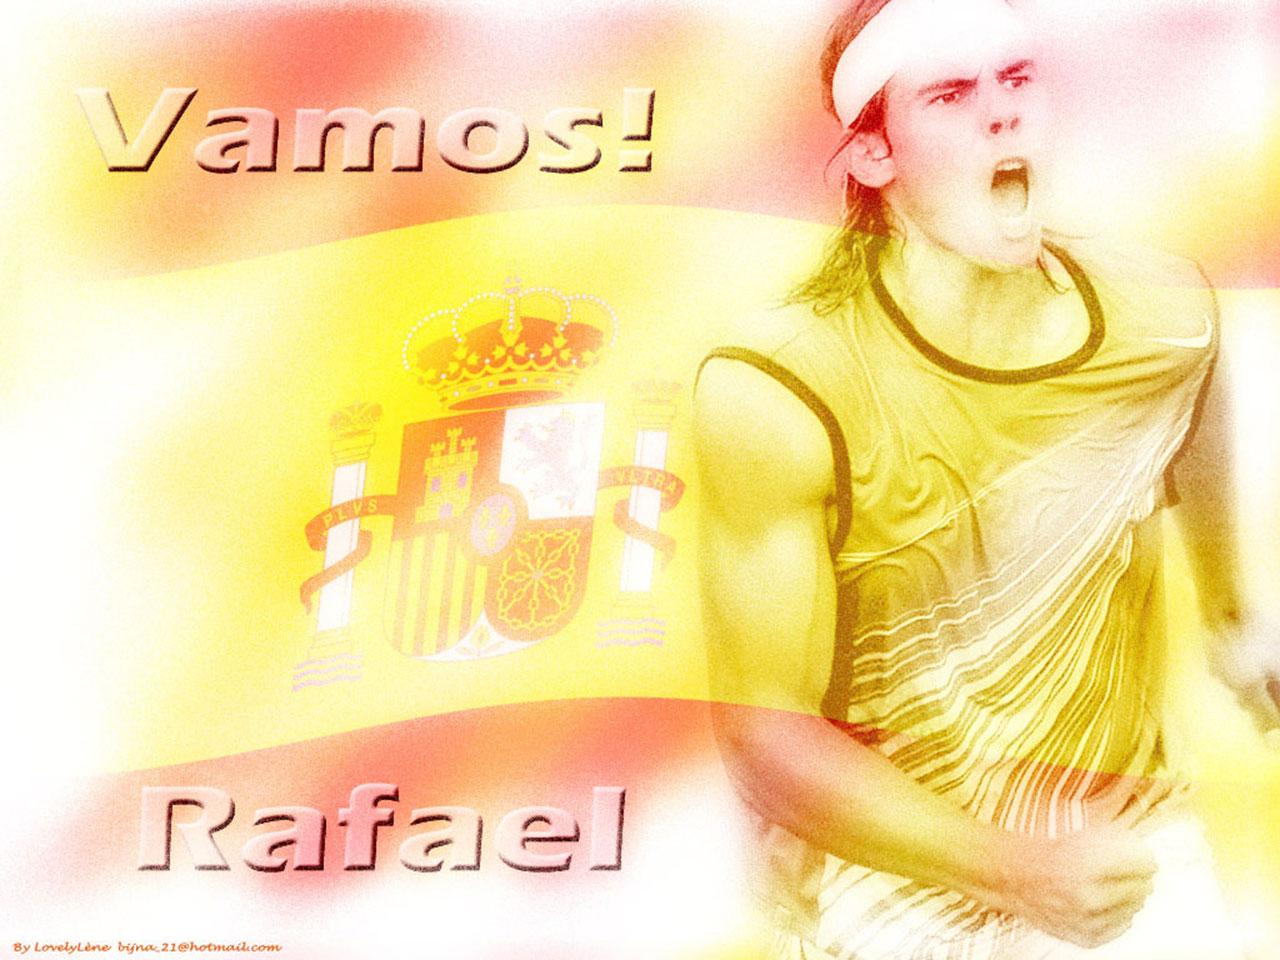 http://3.bp.blogspot.com/__c9qWlUD8Qs/S8NIKZ_MMfI/AAAAAAAAFOo/I8T7AsVoW9k/s1600/Rafael_Nadal_Wallpapers64.jpg